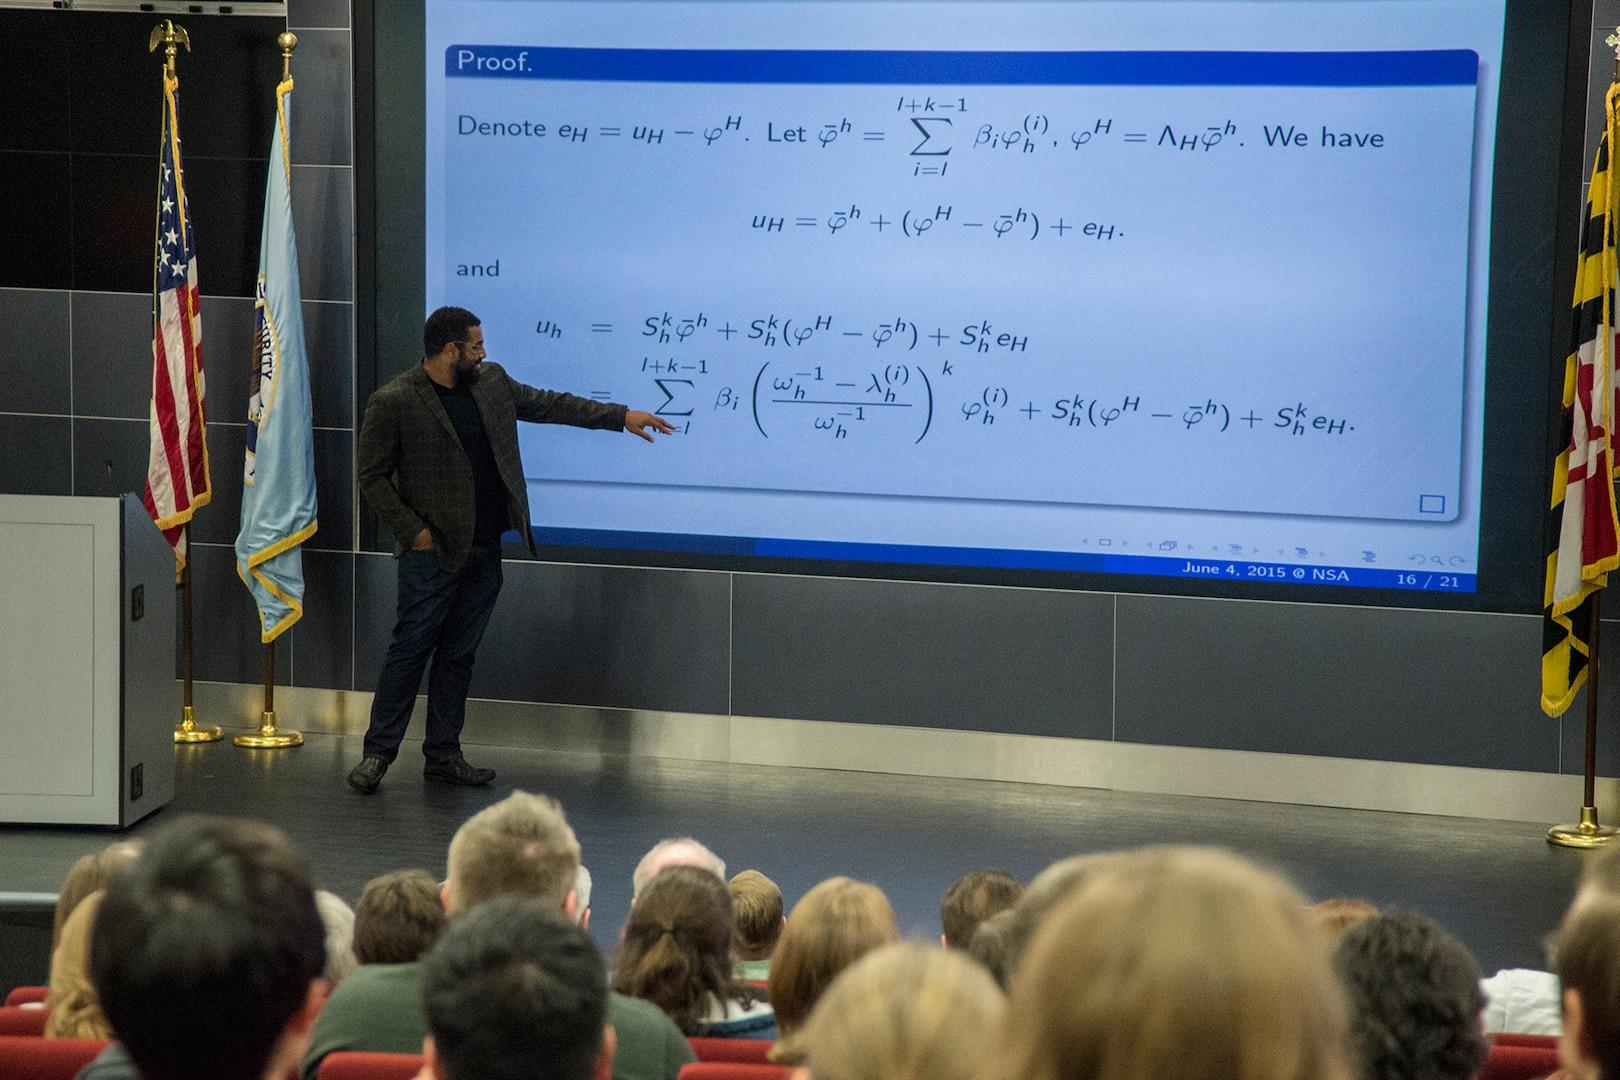 Urschel's paper is titled 'A Cascadic Multigrid Algorithm for Computing the Fiedler Vector of Graph Laplacians.'